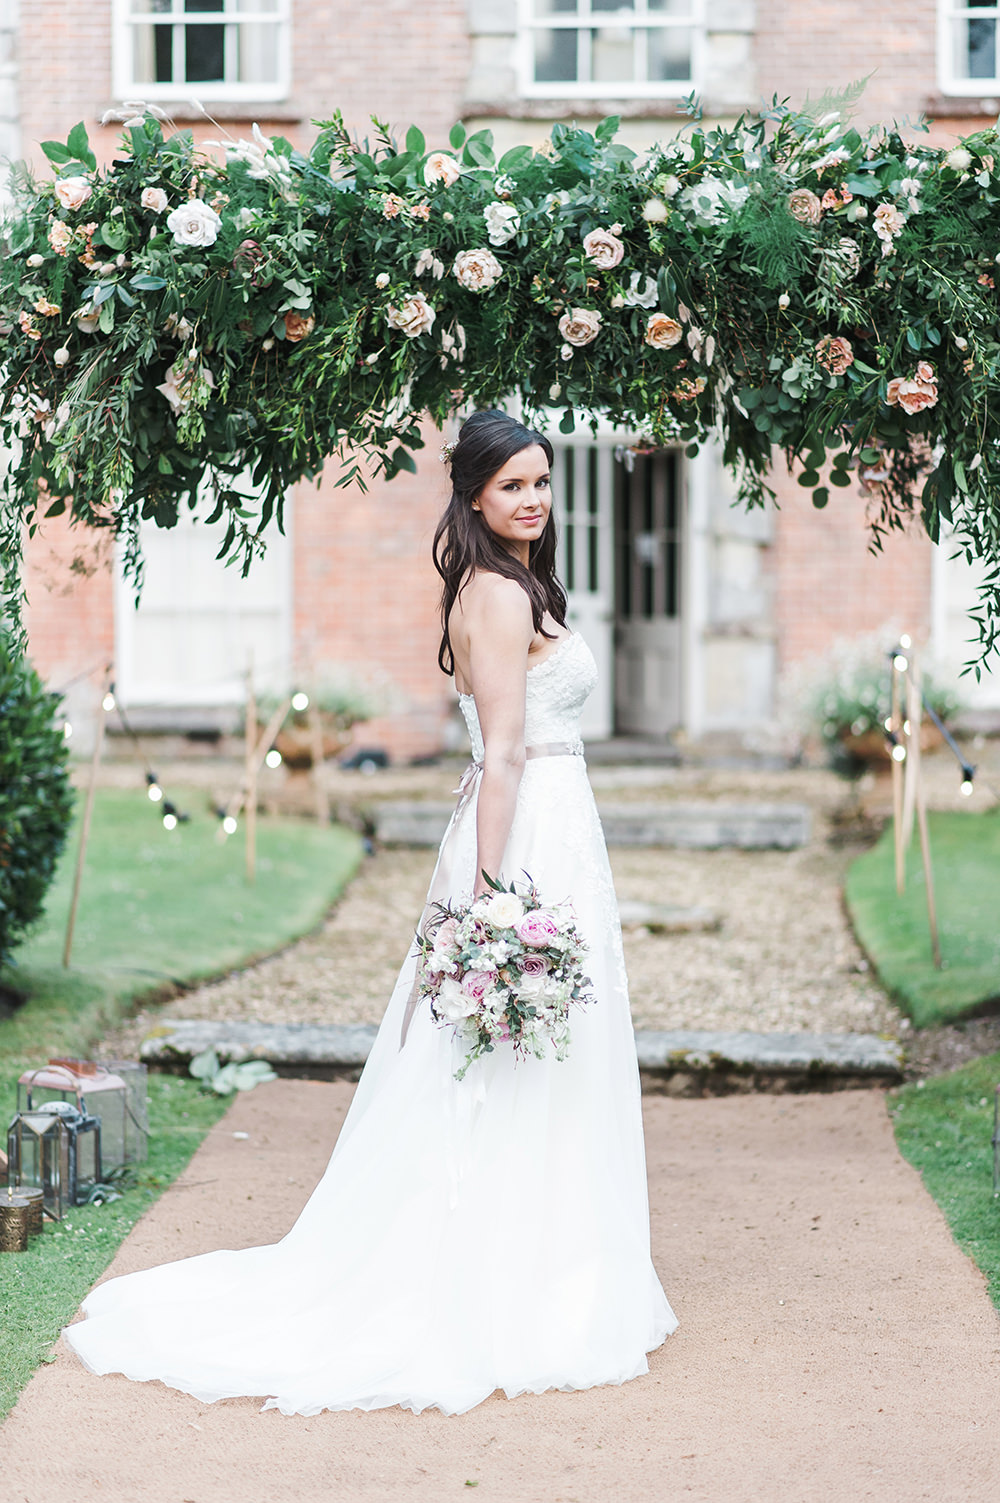 Bride Bridal Gown Dress Strapless Sweetheart Neckline Ribbon Belt Pink Foliage Greenery Rose Arch Archway Edmondsham House Wedding Darima Frampton Photography